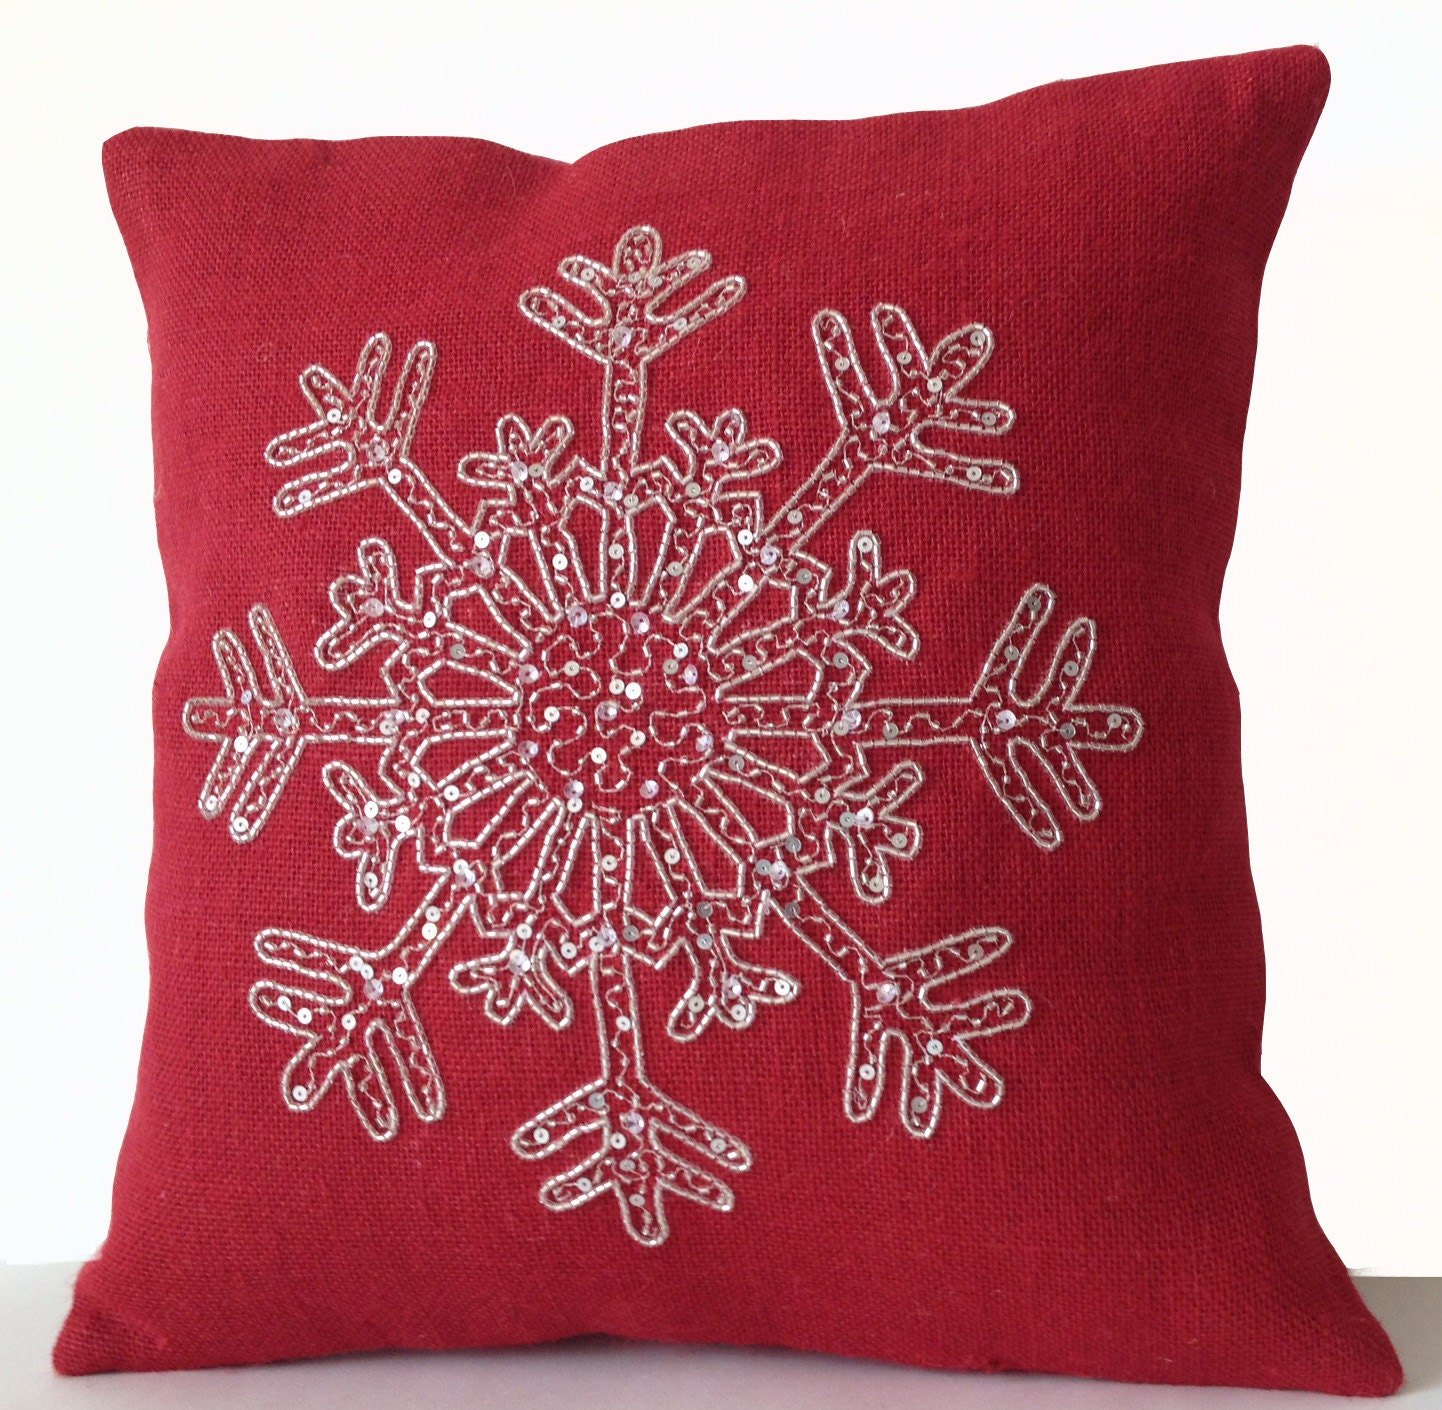 Christmas Pillow Cover Snow Flake Pillow Red Burlap Pillows